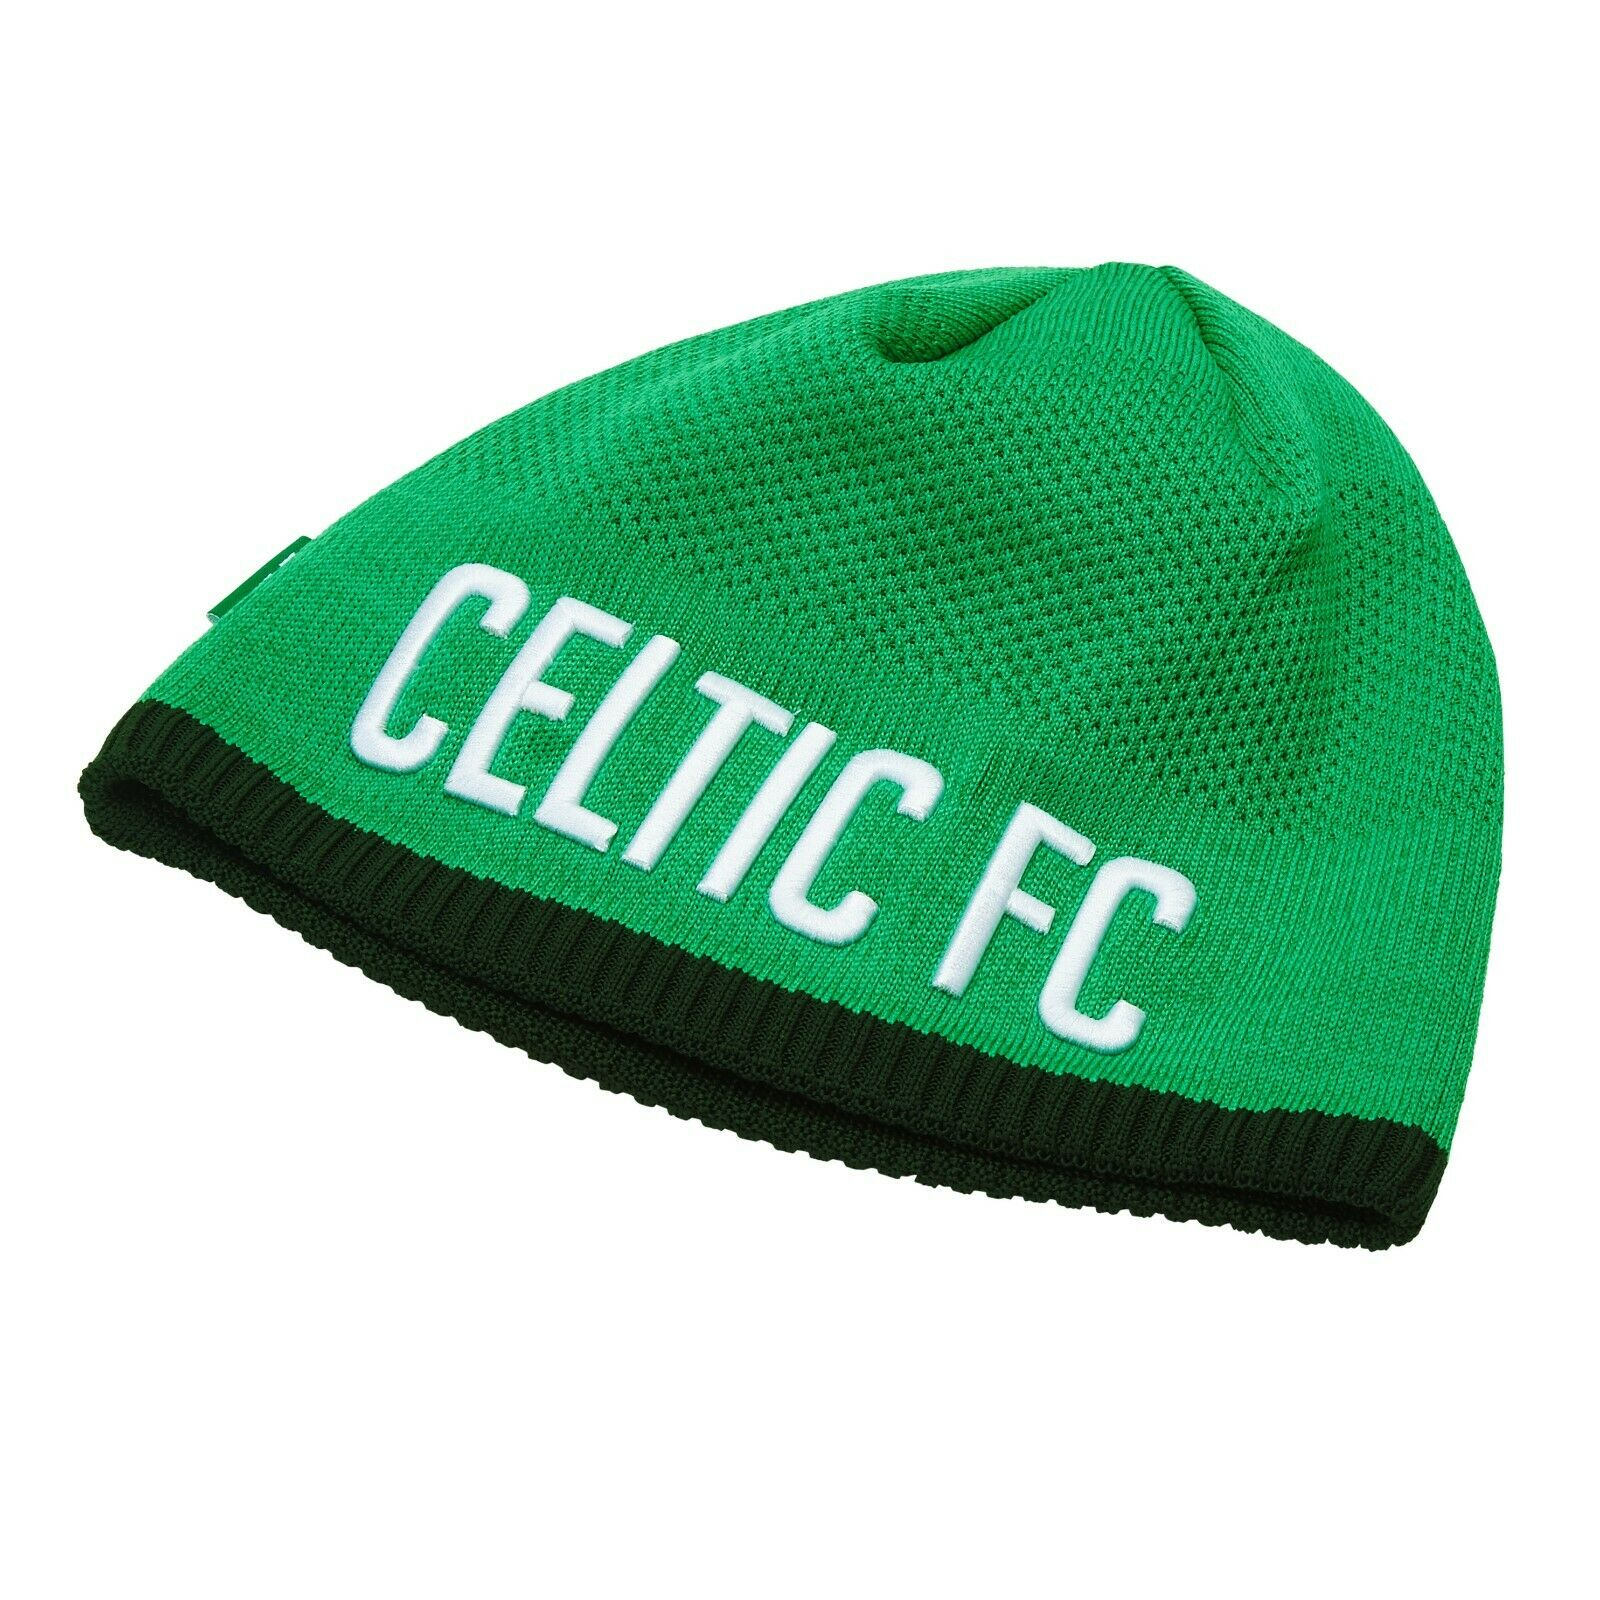 New Balance Celtic FC Season 2018 - 2019 Soccer Stadium Wolie Beanie Grün